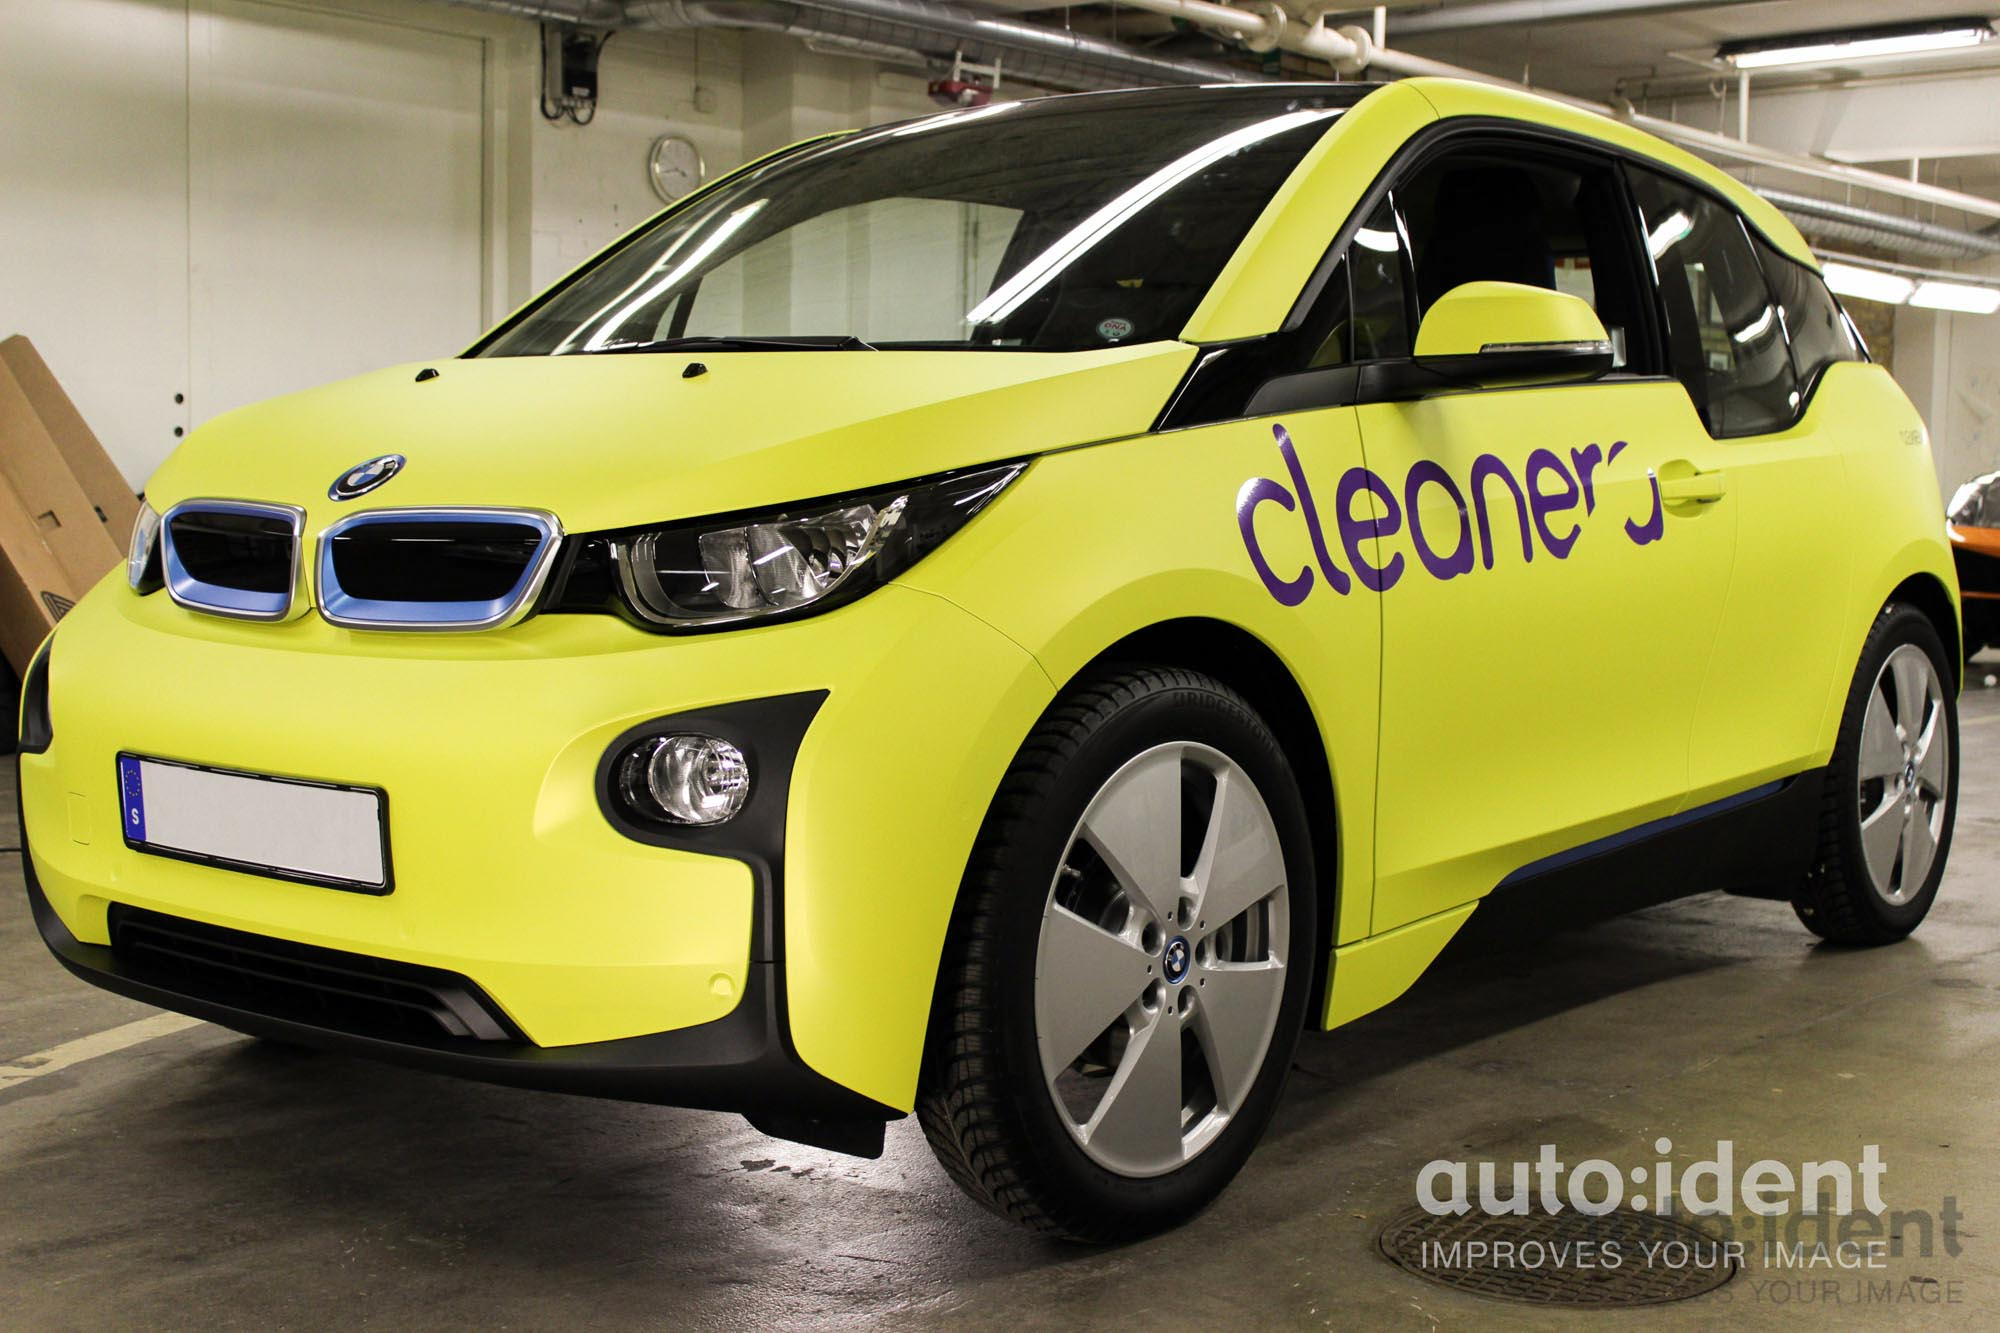 Cleanera - BMW i3 - Aluminum Yellow - Auto Ident